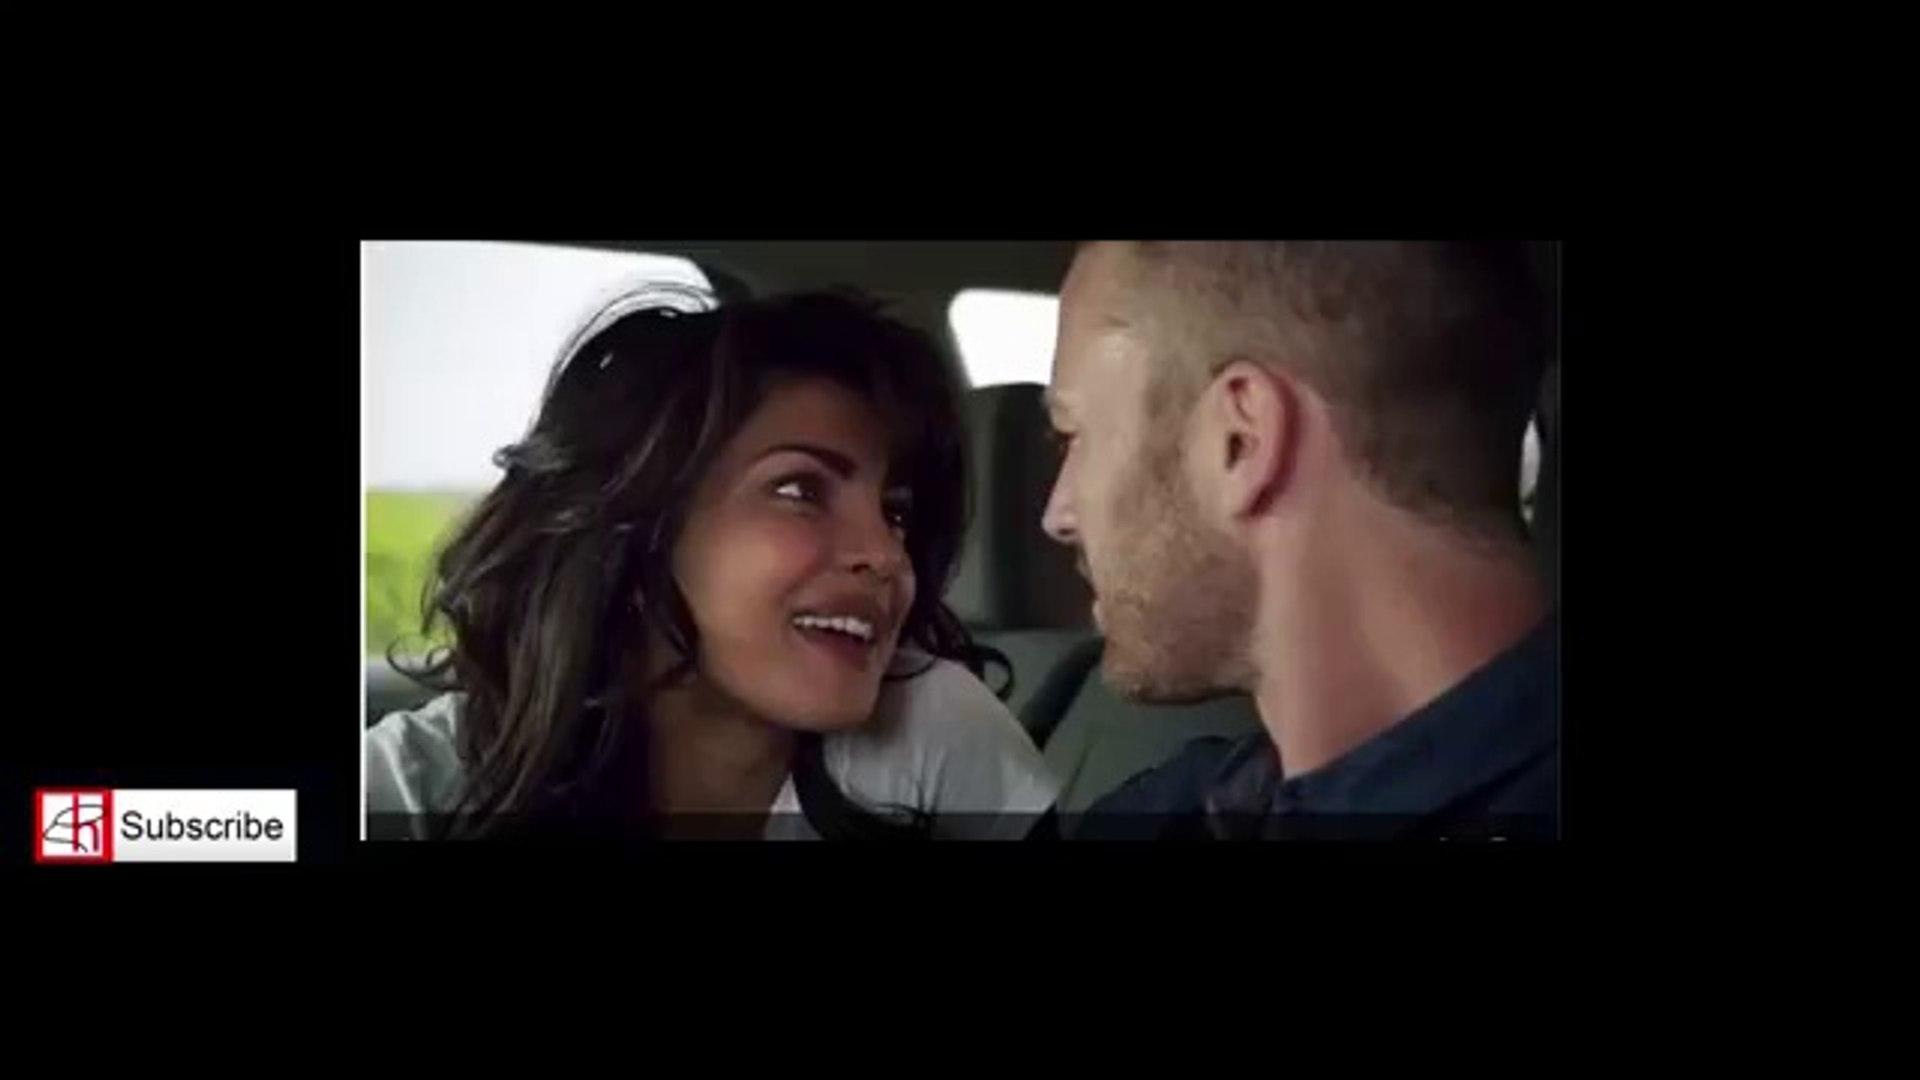 Priyanka Chopra Quantico - Trailer Review - New Bollywood Movies News 2015